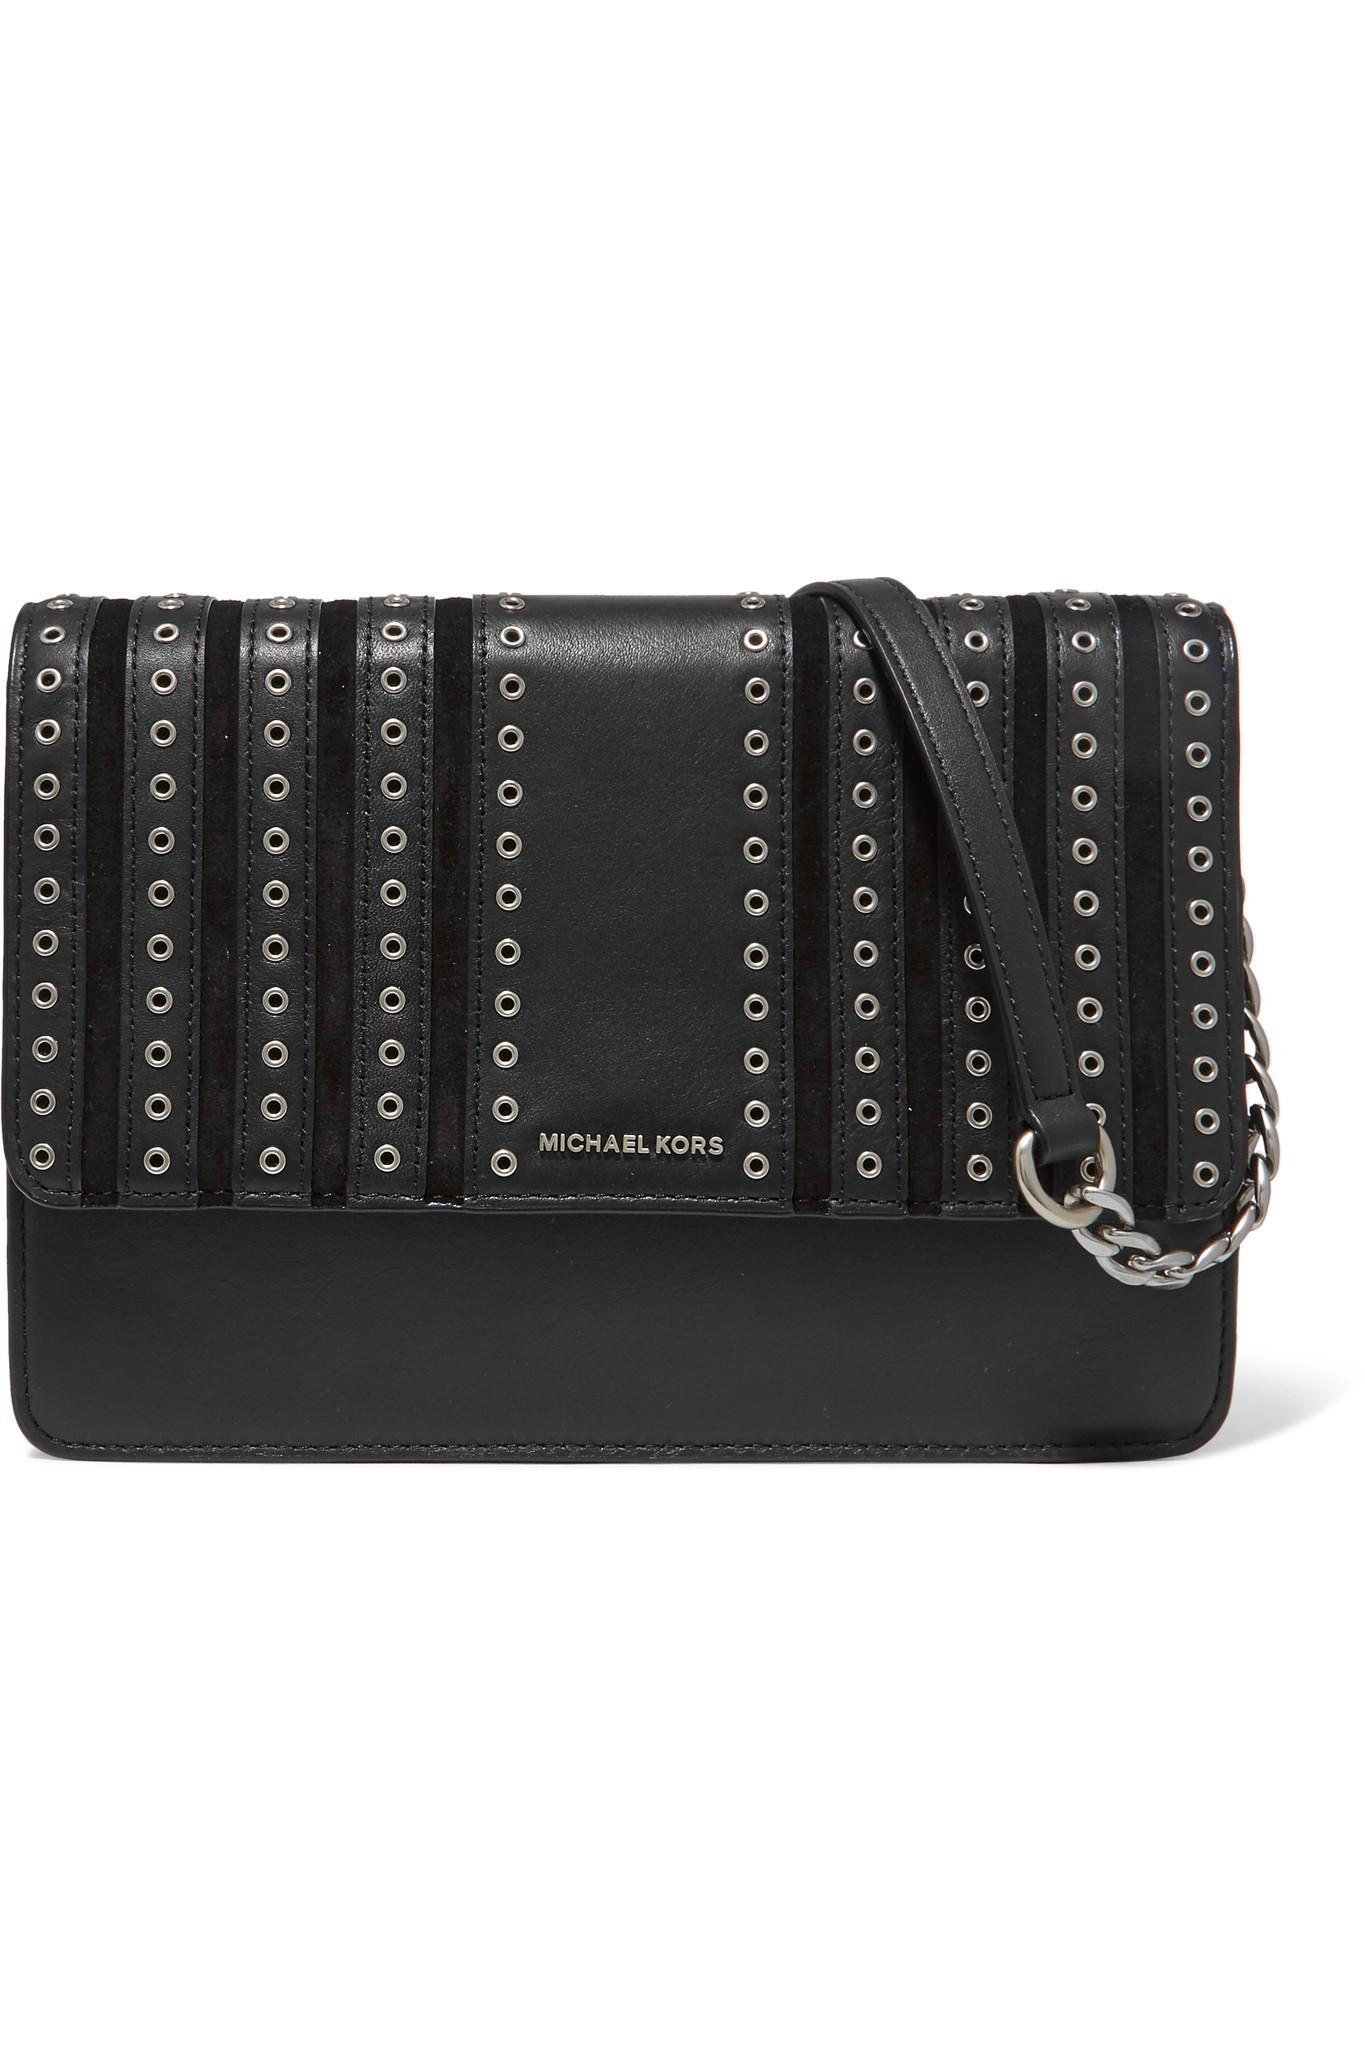 5442d6974ada4d Michael Kors Brooklyn Large Leather Shoulder Bag Black | Dr.Paul